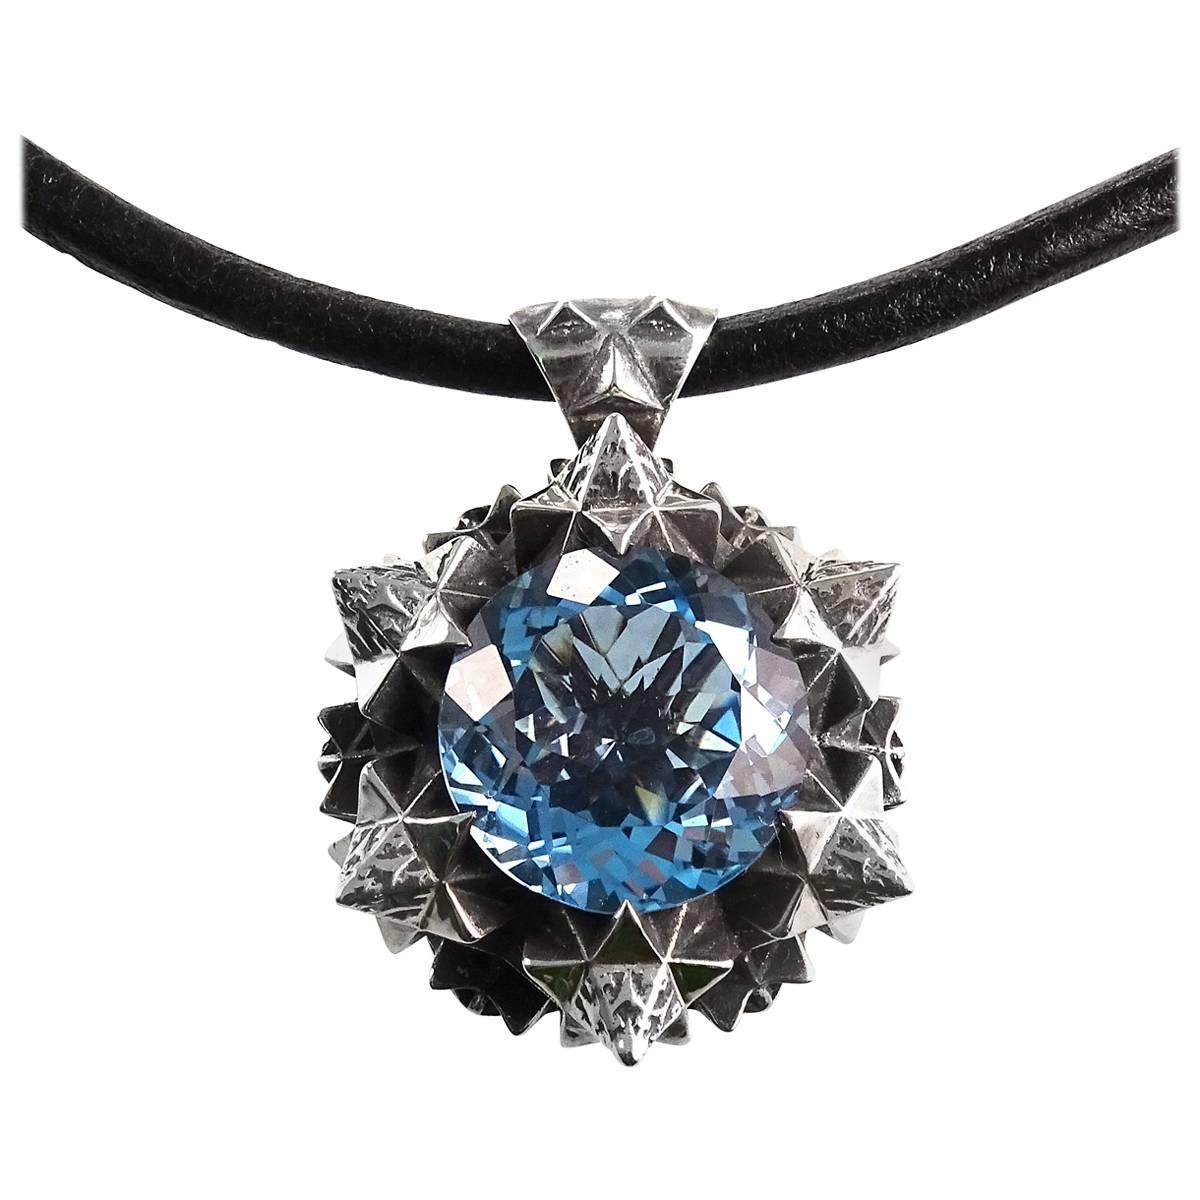 Thoscene Aquamarine Silver Peace Pendant Necklace